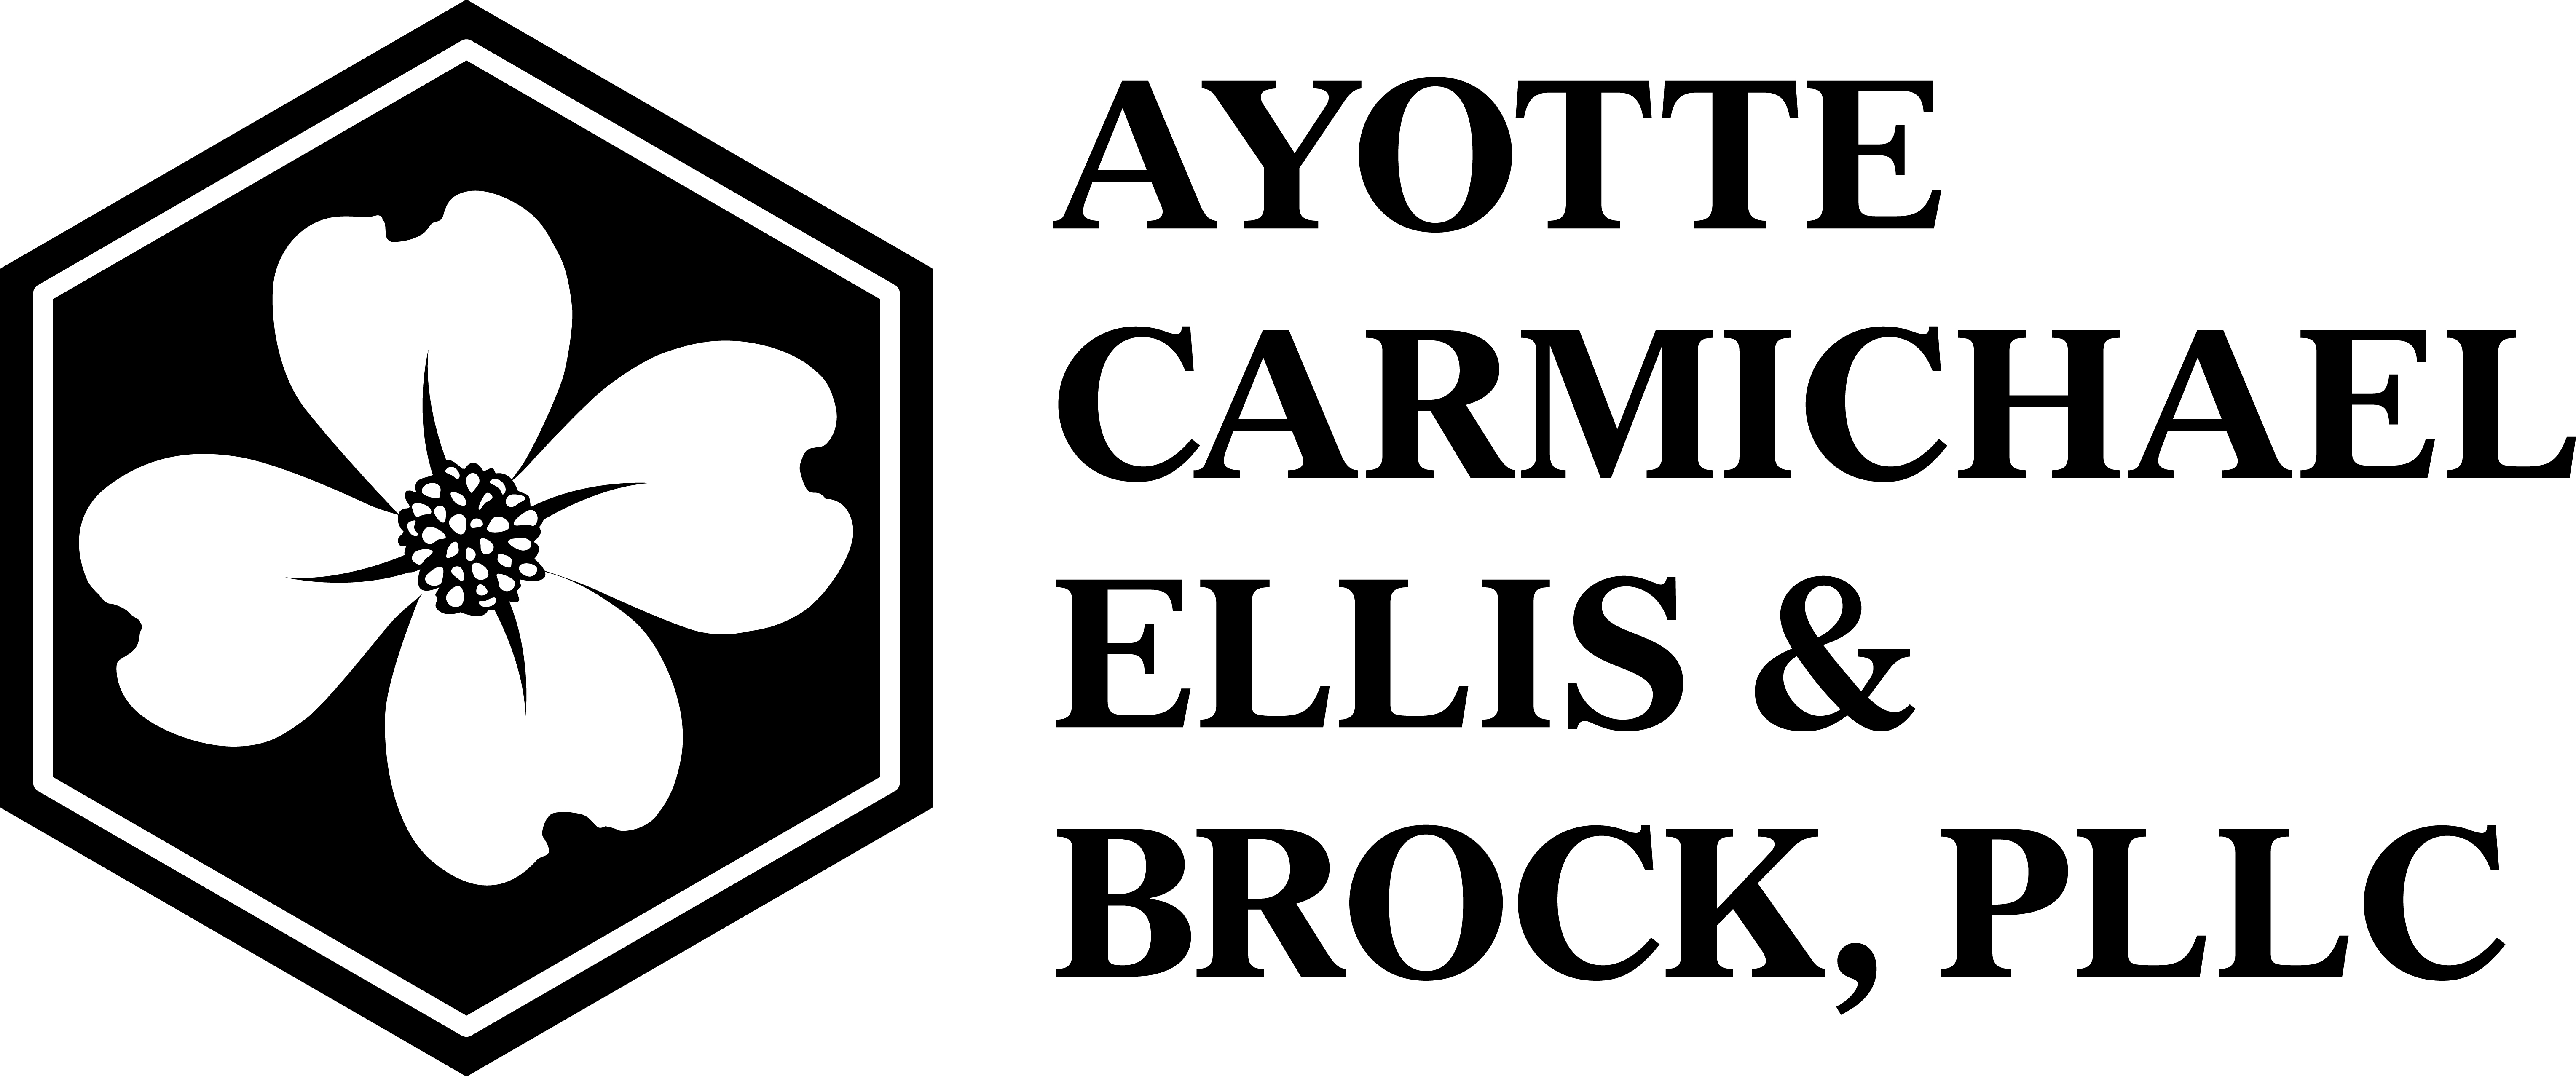 Ayotte, Carmichael, Ellis, & Brock PLLC